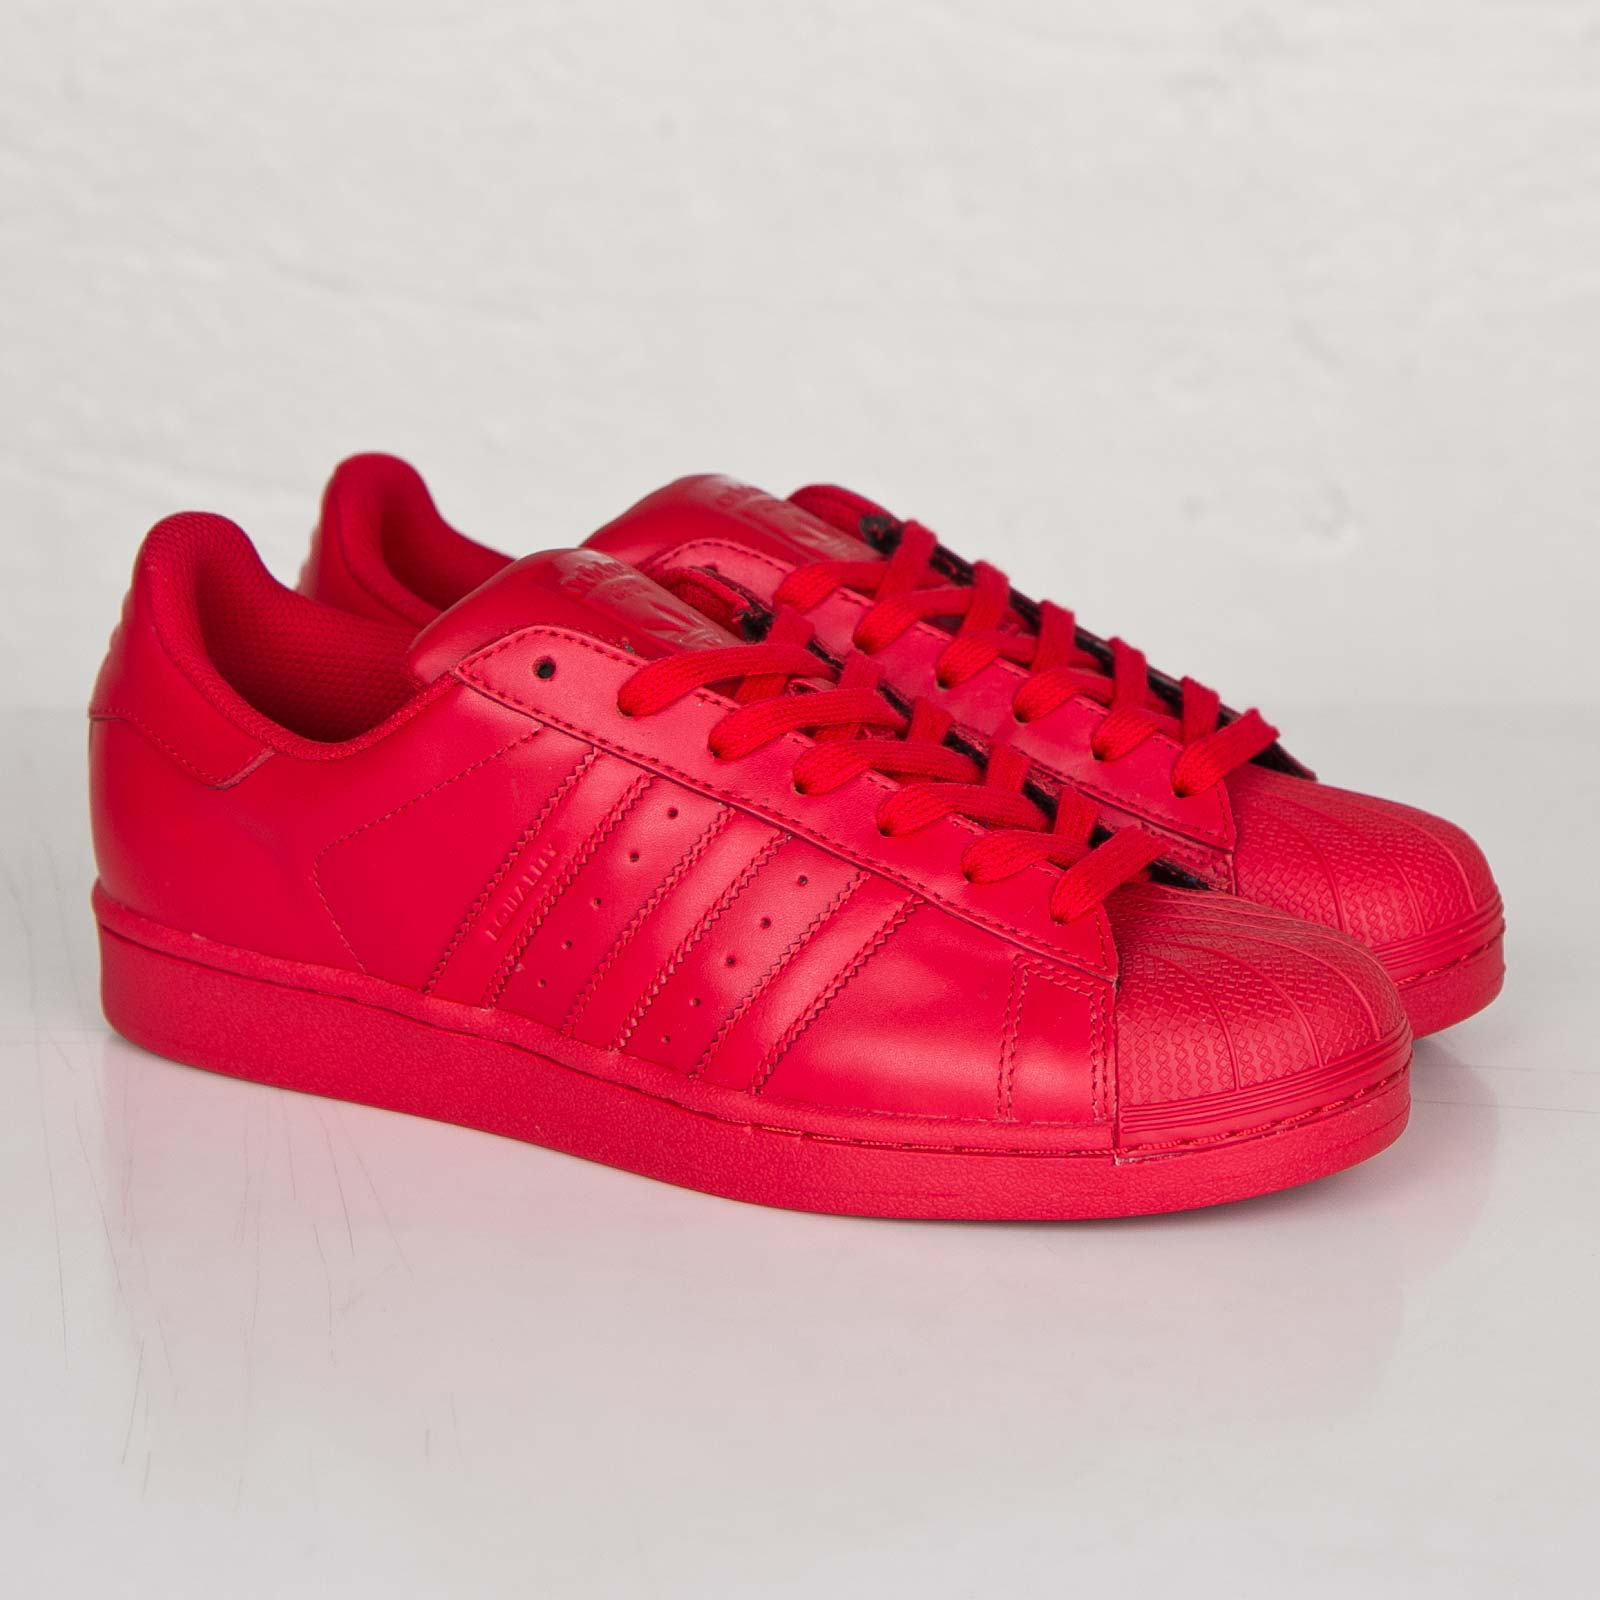 timeless design 0e982 69aaa adidas Superstar Supercolor Pack - S41833 - Sneakersnstuff ...